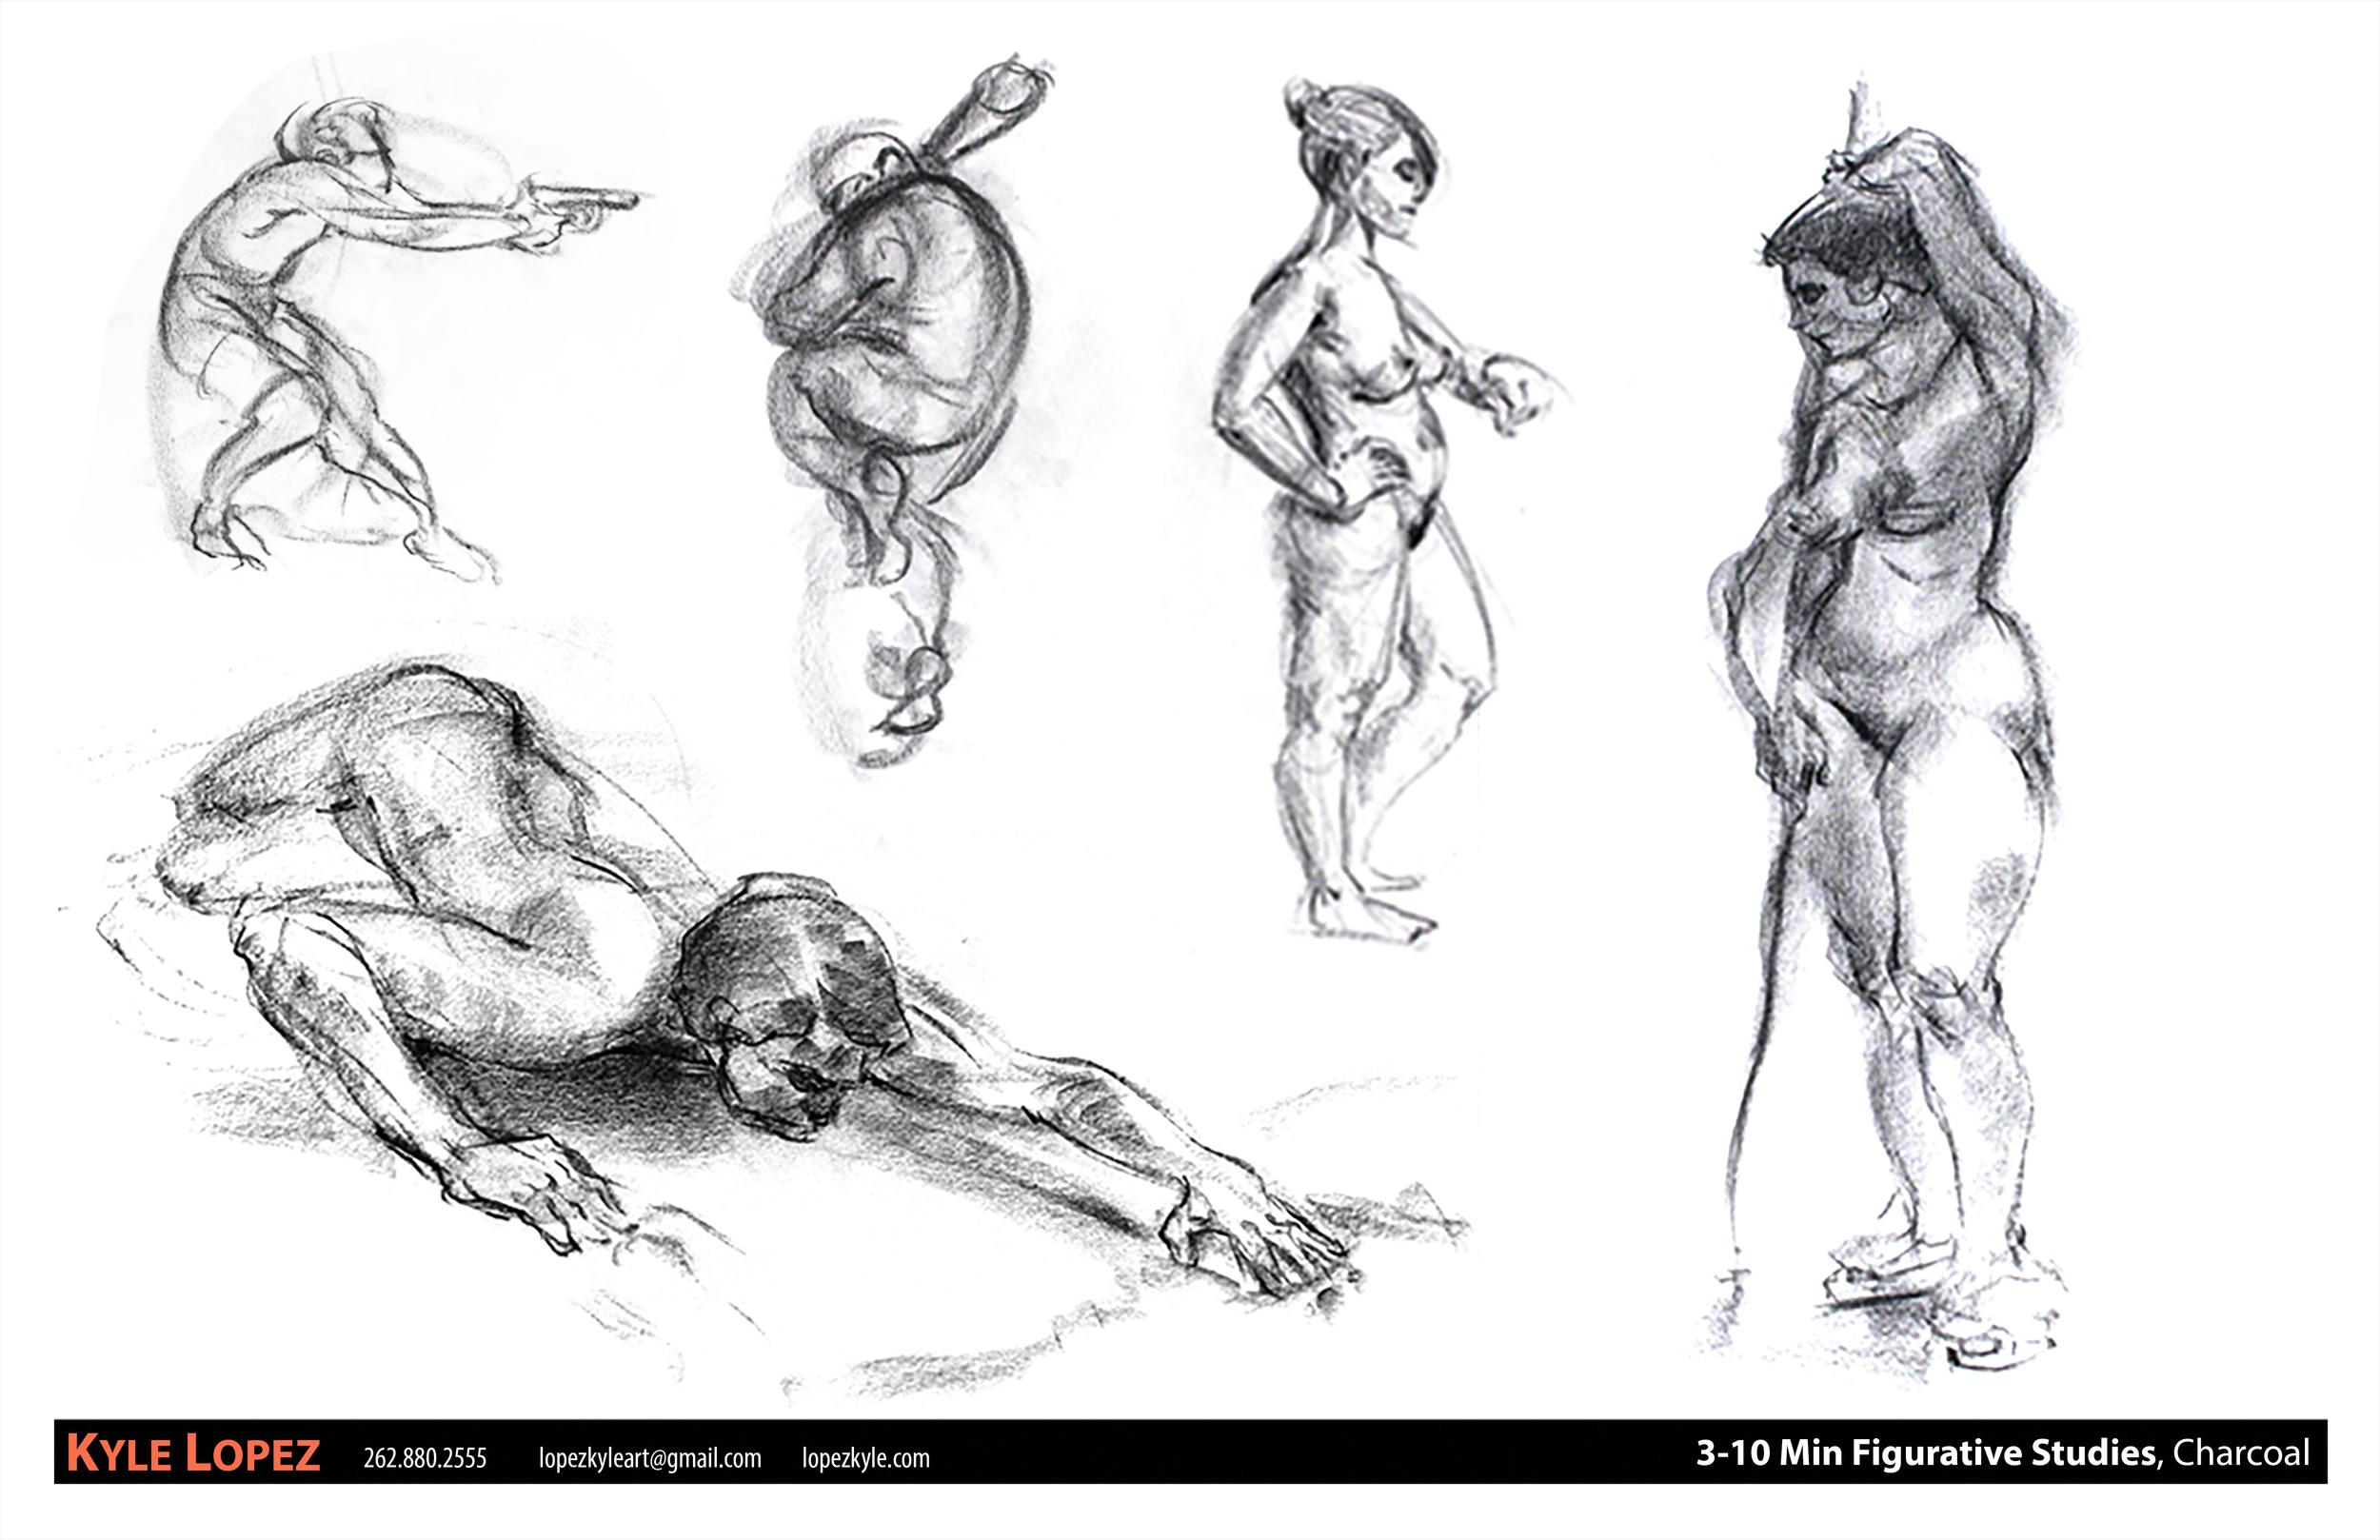 FigurativeStudies.jpg